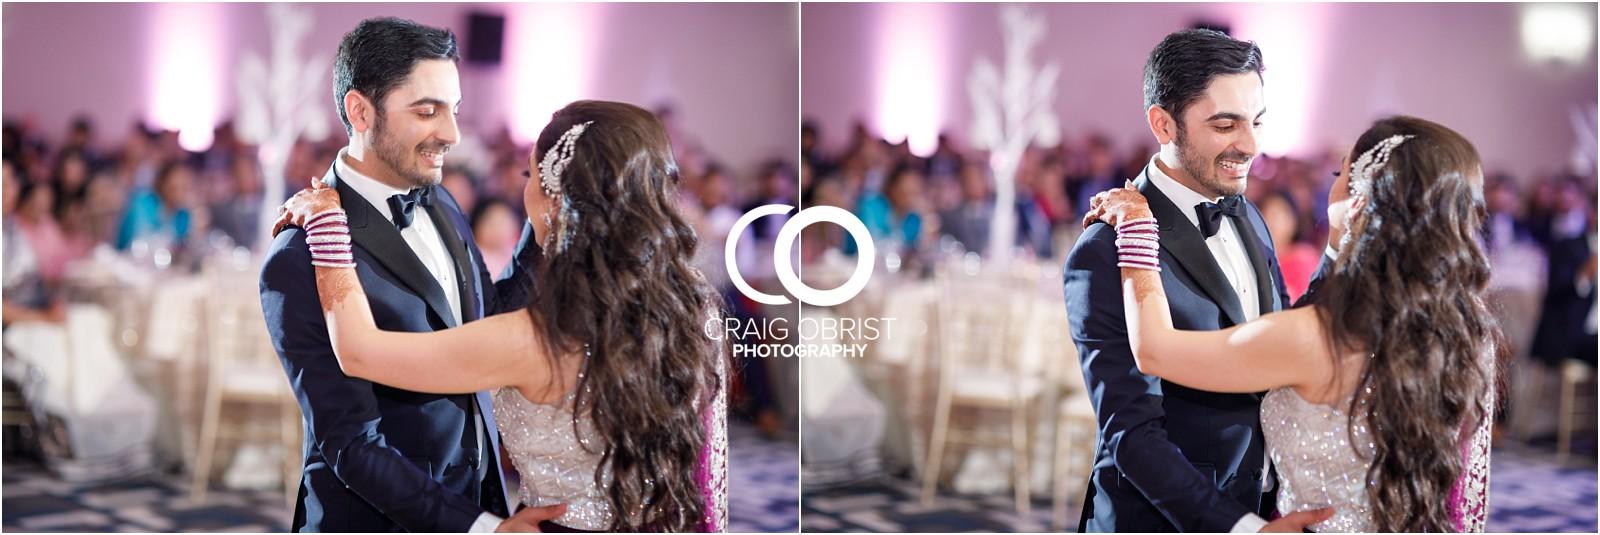 Atlanta Hilton Northeast South Asian Wedding Portraits_0053.jpg